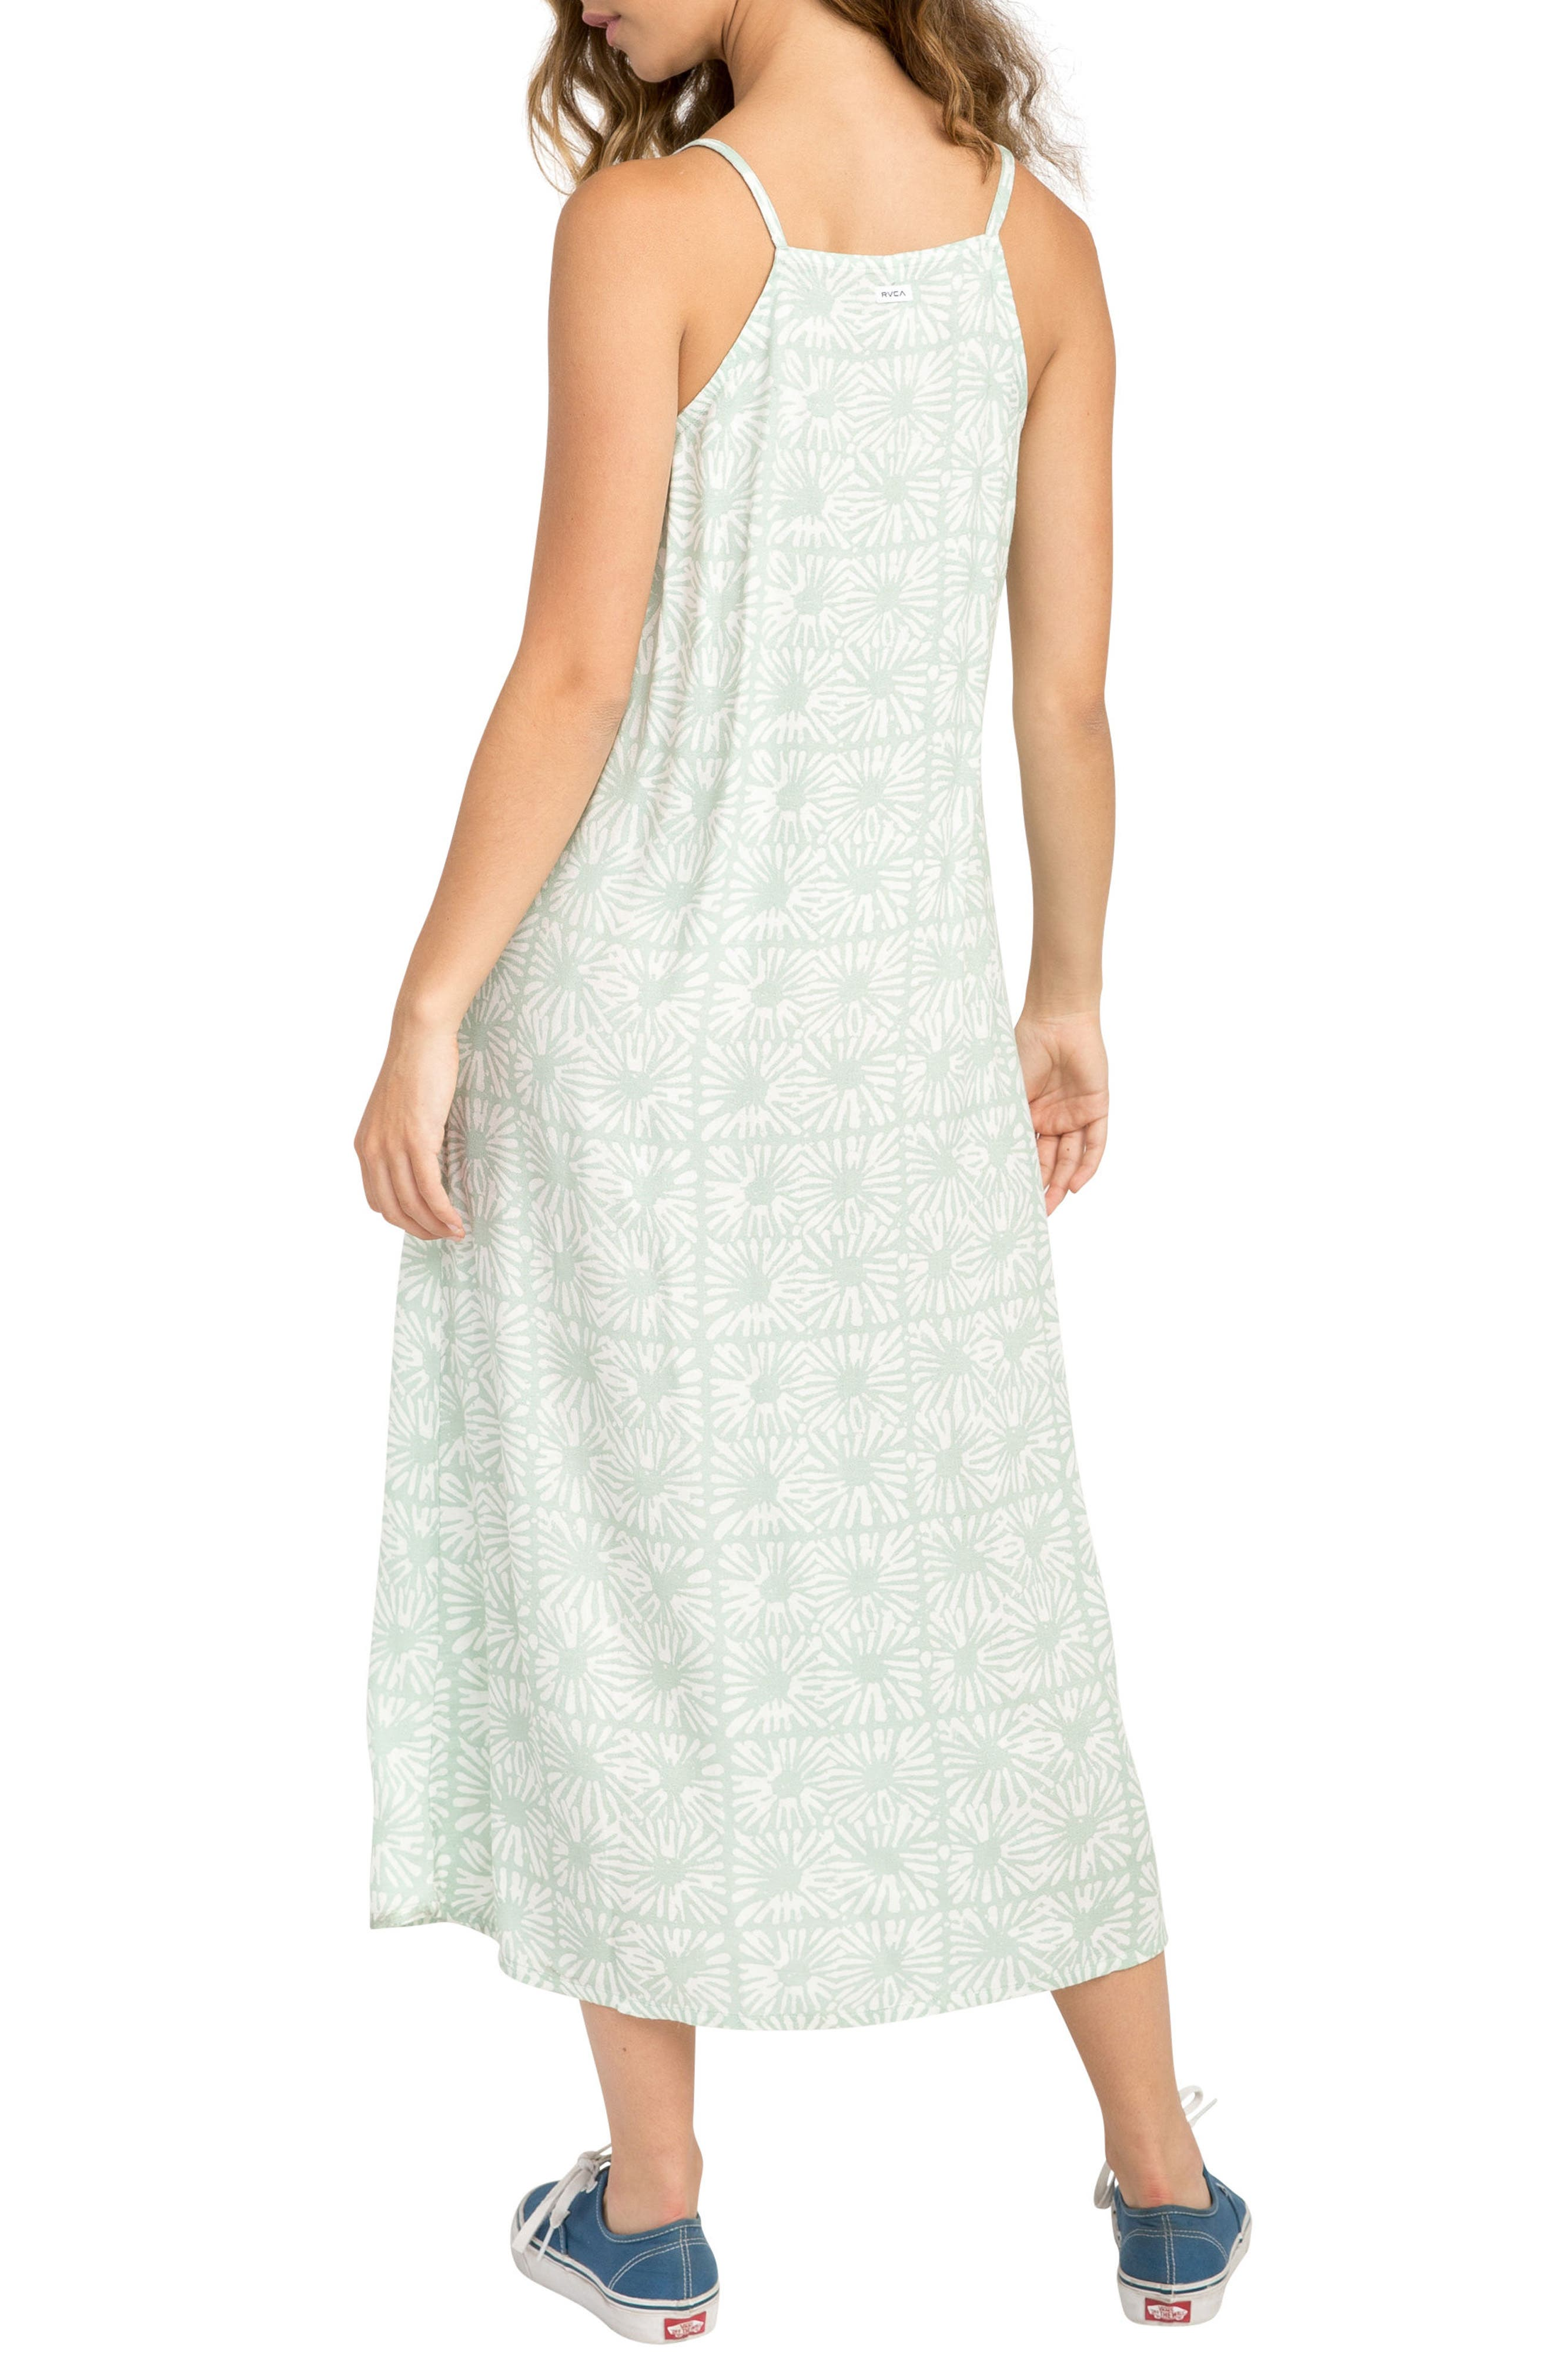 Garland Print Midi Dress,                             Alternate thumbnail 2, color,                             Artichoke